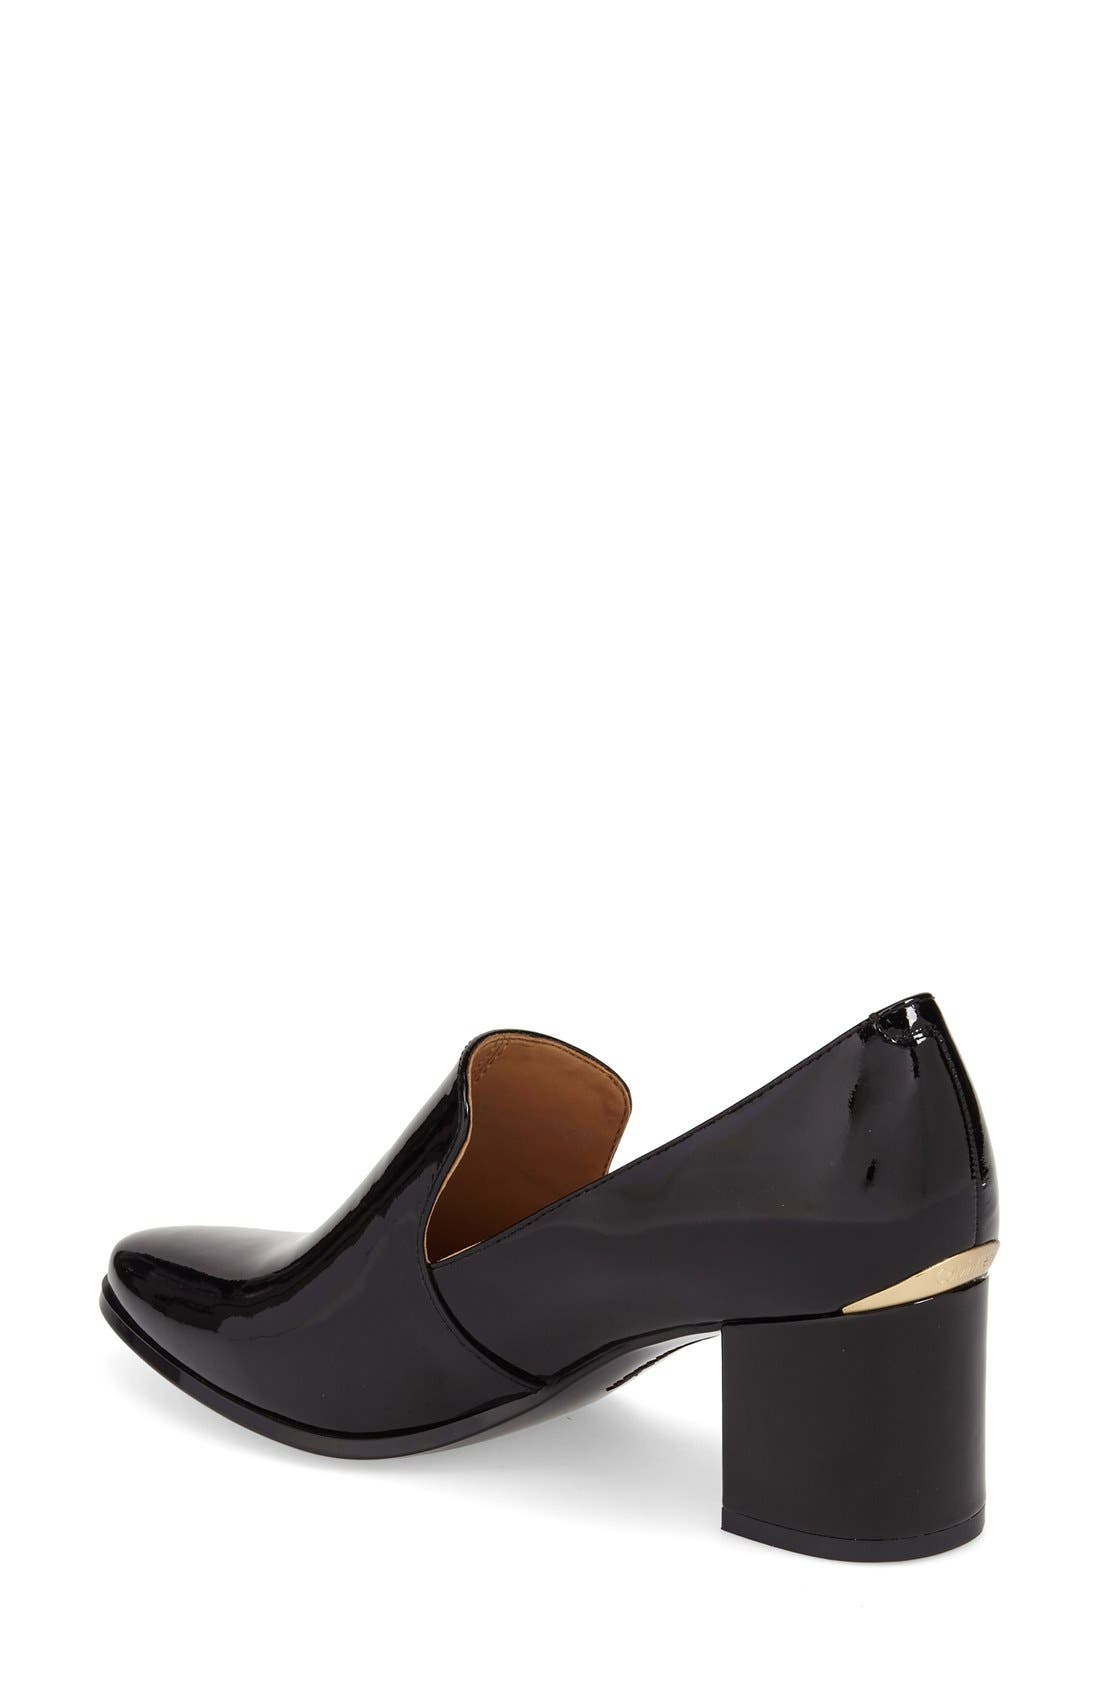 Alternate Image 2  - Calvin Klein 'Faye' Block Heel Pump (Women)